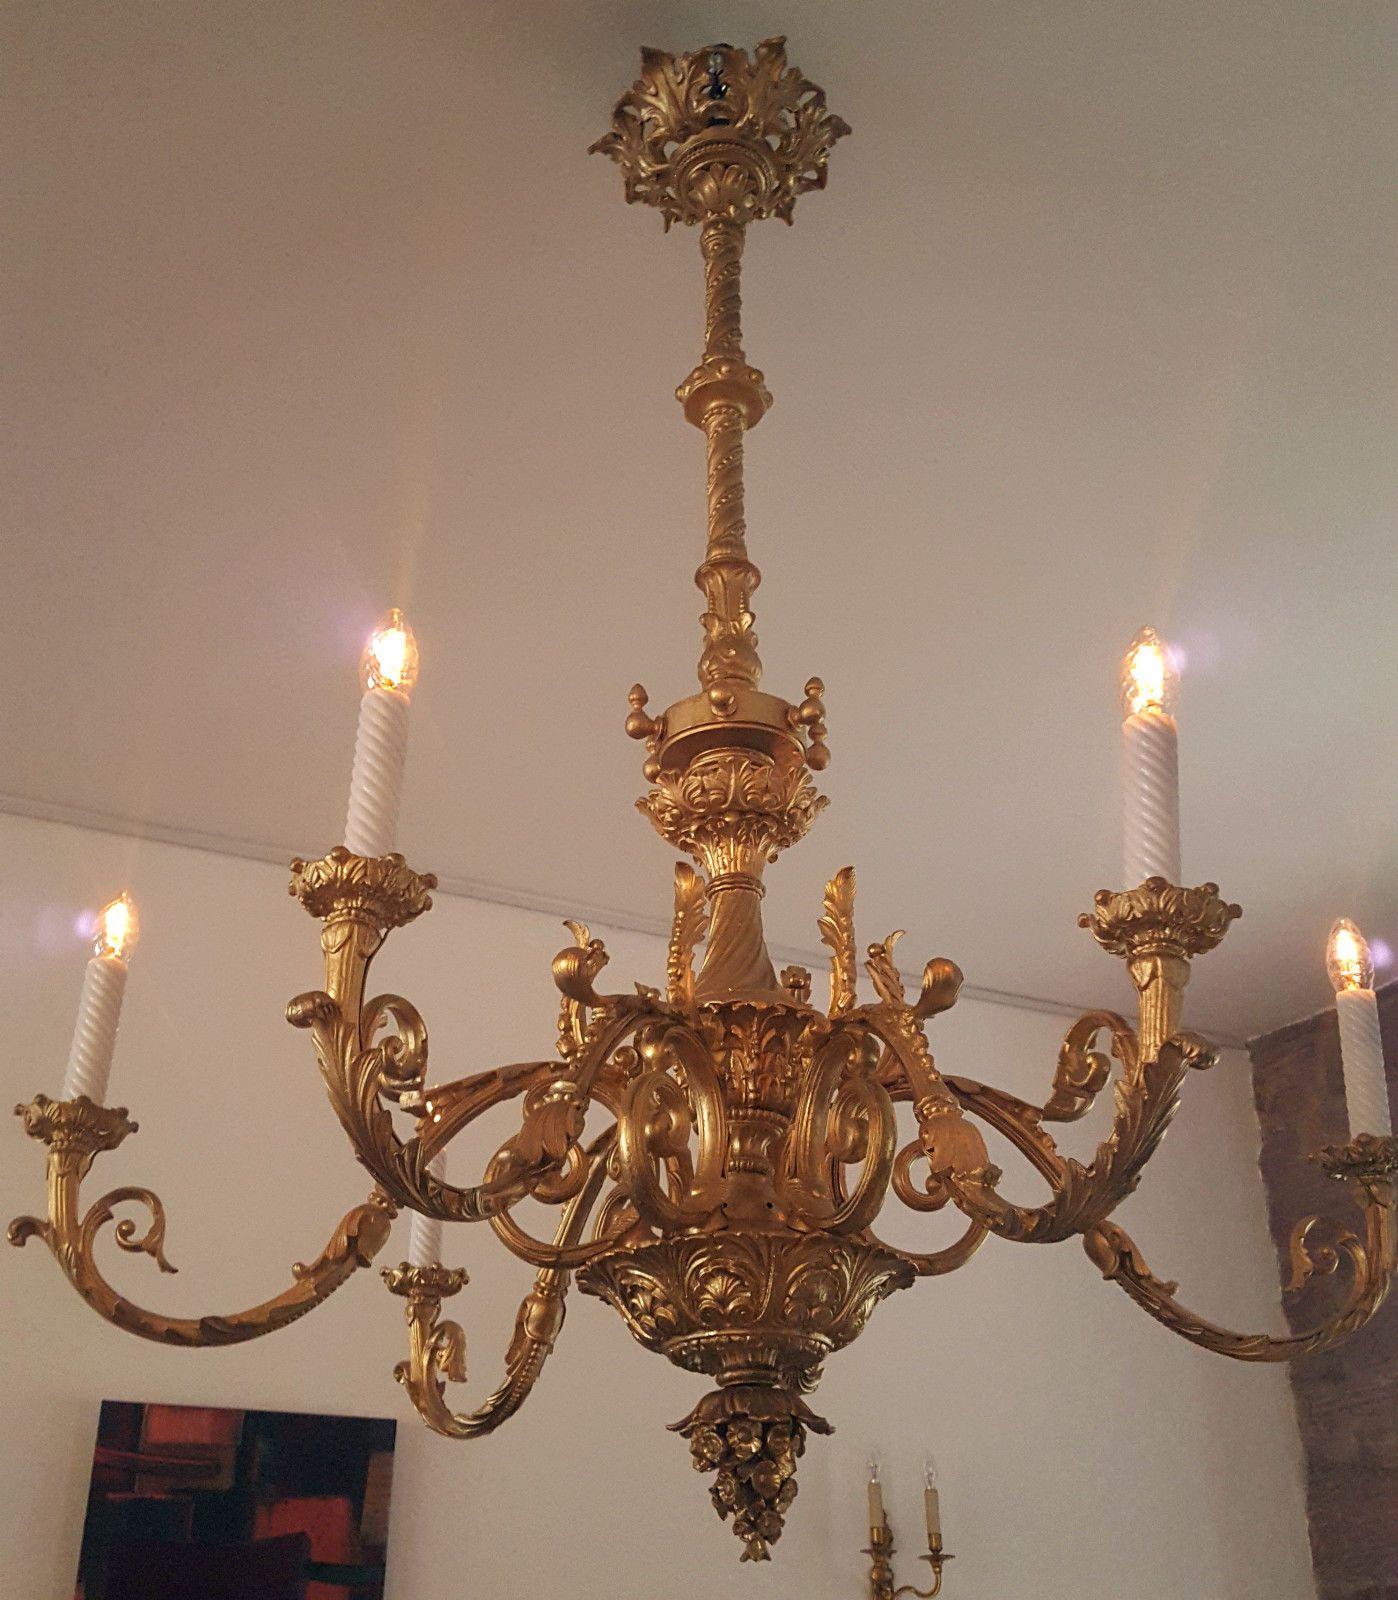 Paar Kronleuchter Antik Lüster Pair Chandelier Antique Barock Baroque Louis Xiv Chandelier Antiques Baroque